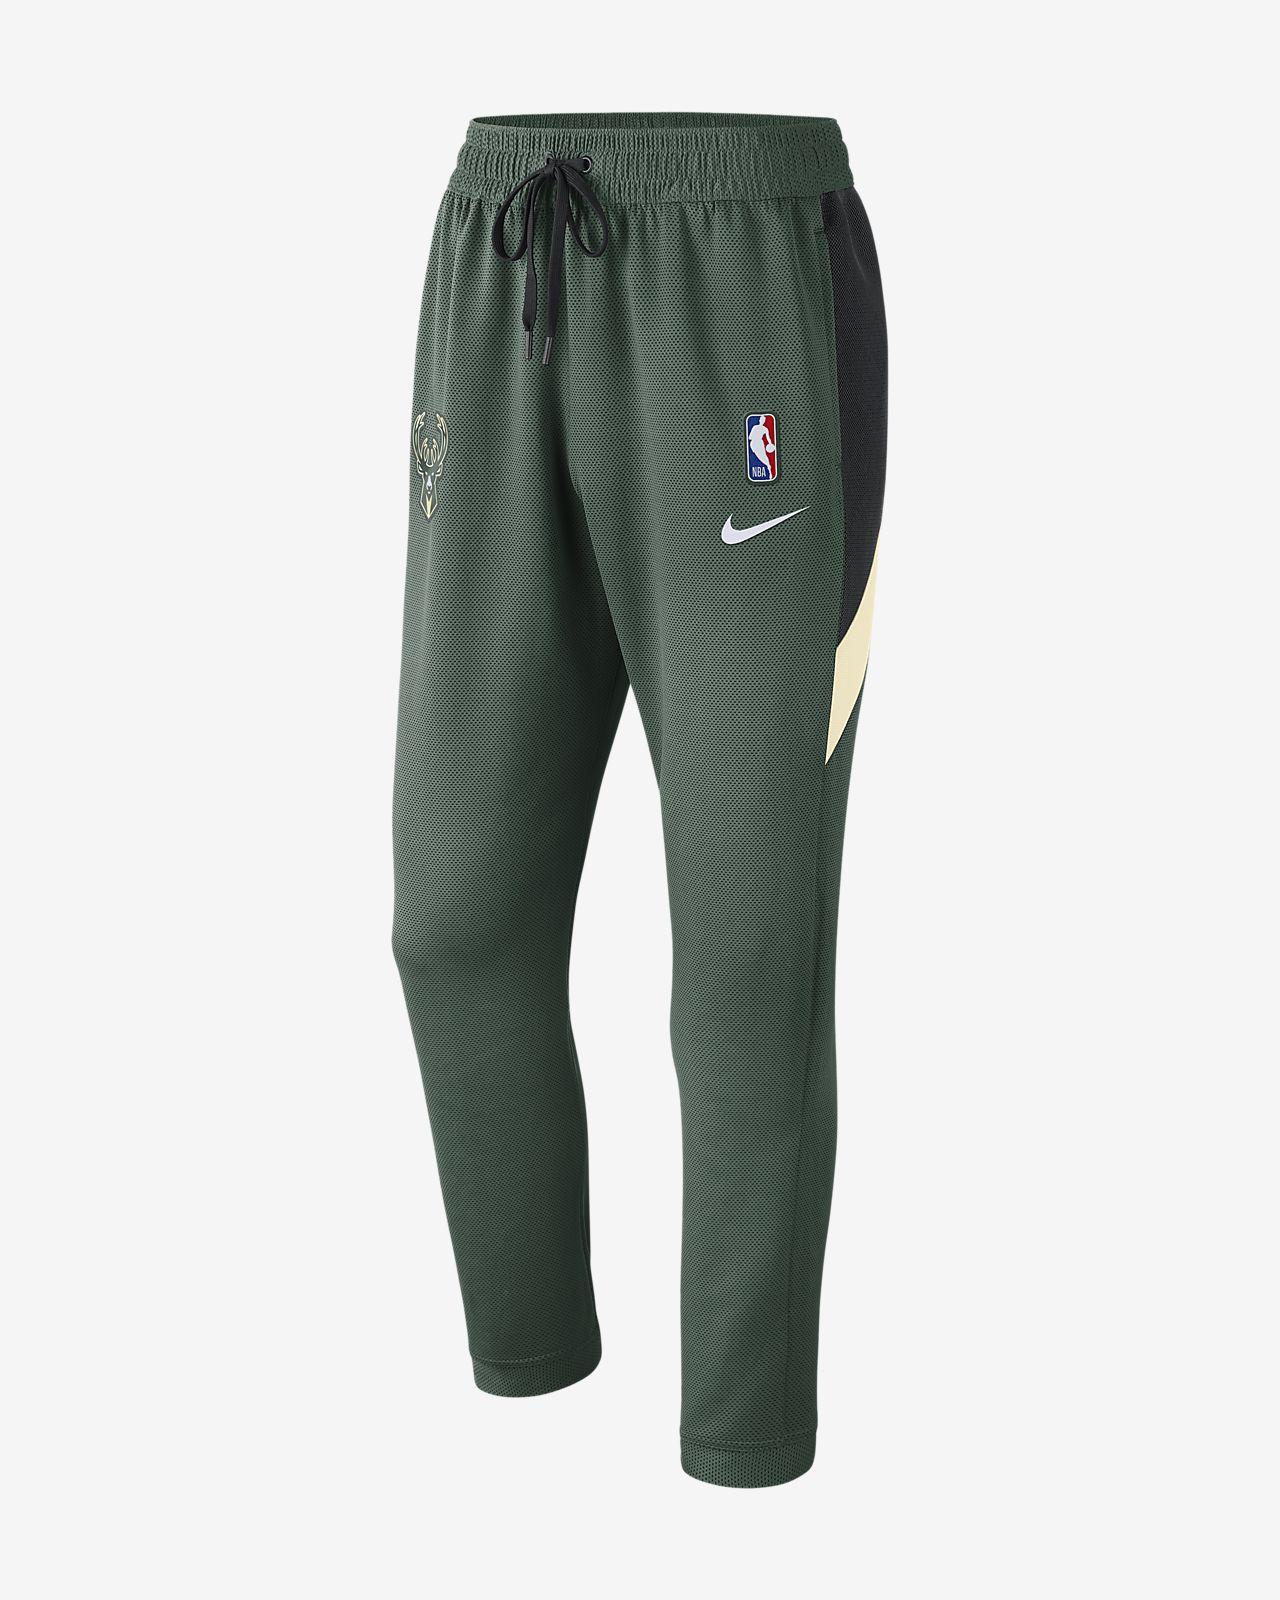 Pantalones de la NBA para hombre Milwaukee Bucks Nike Therma Flex Showtime